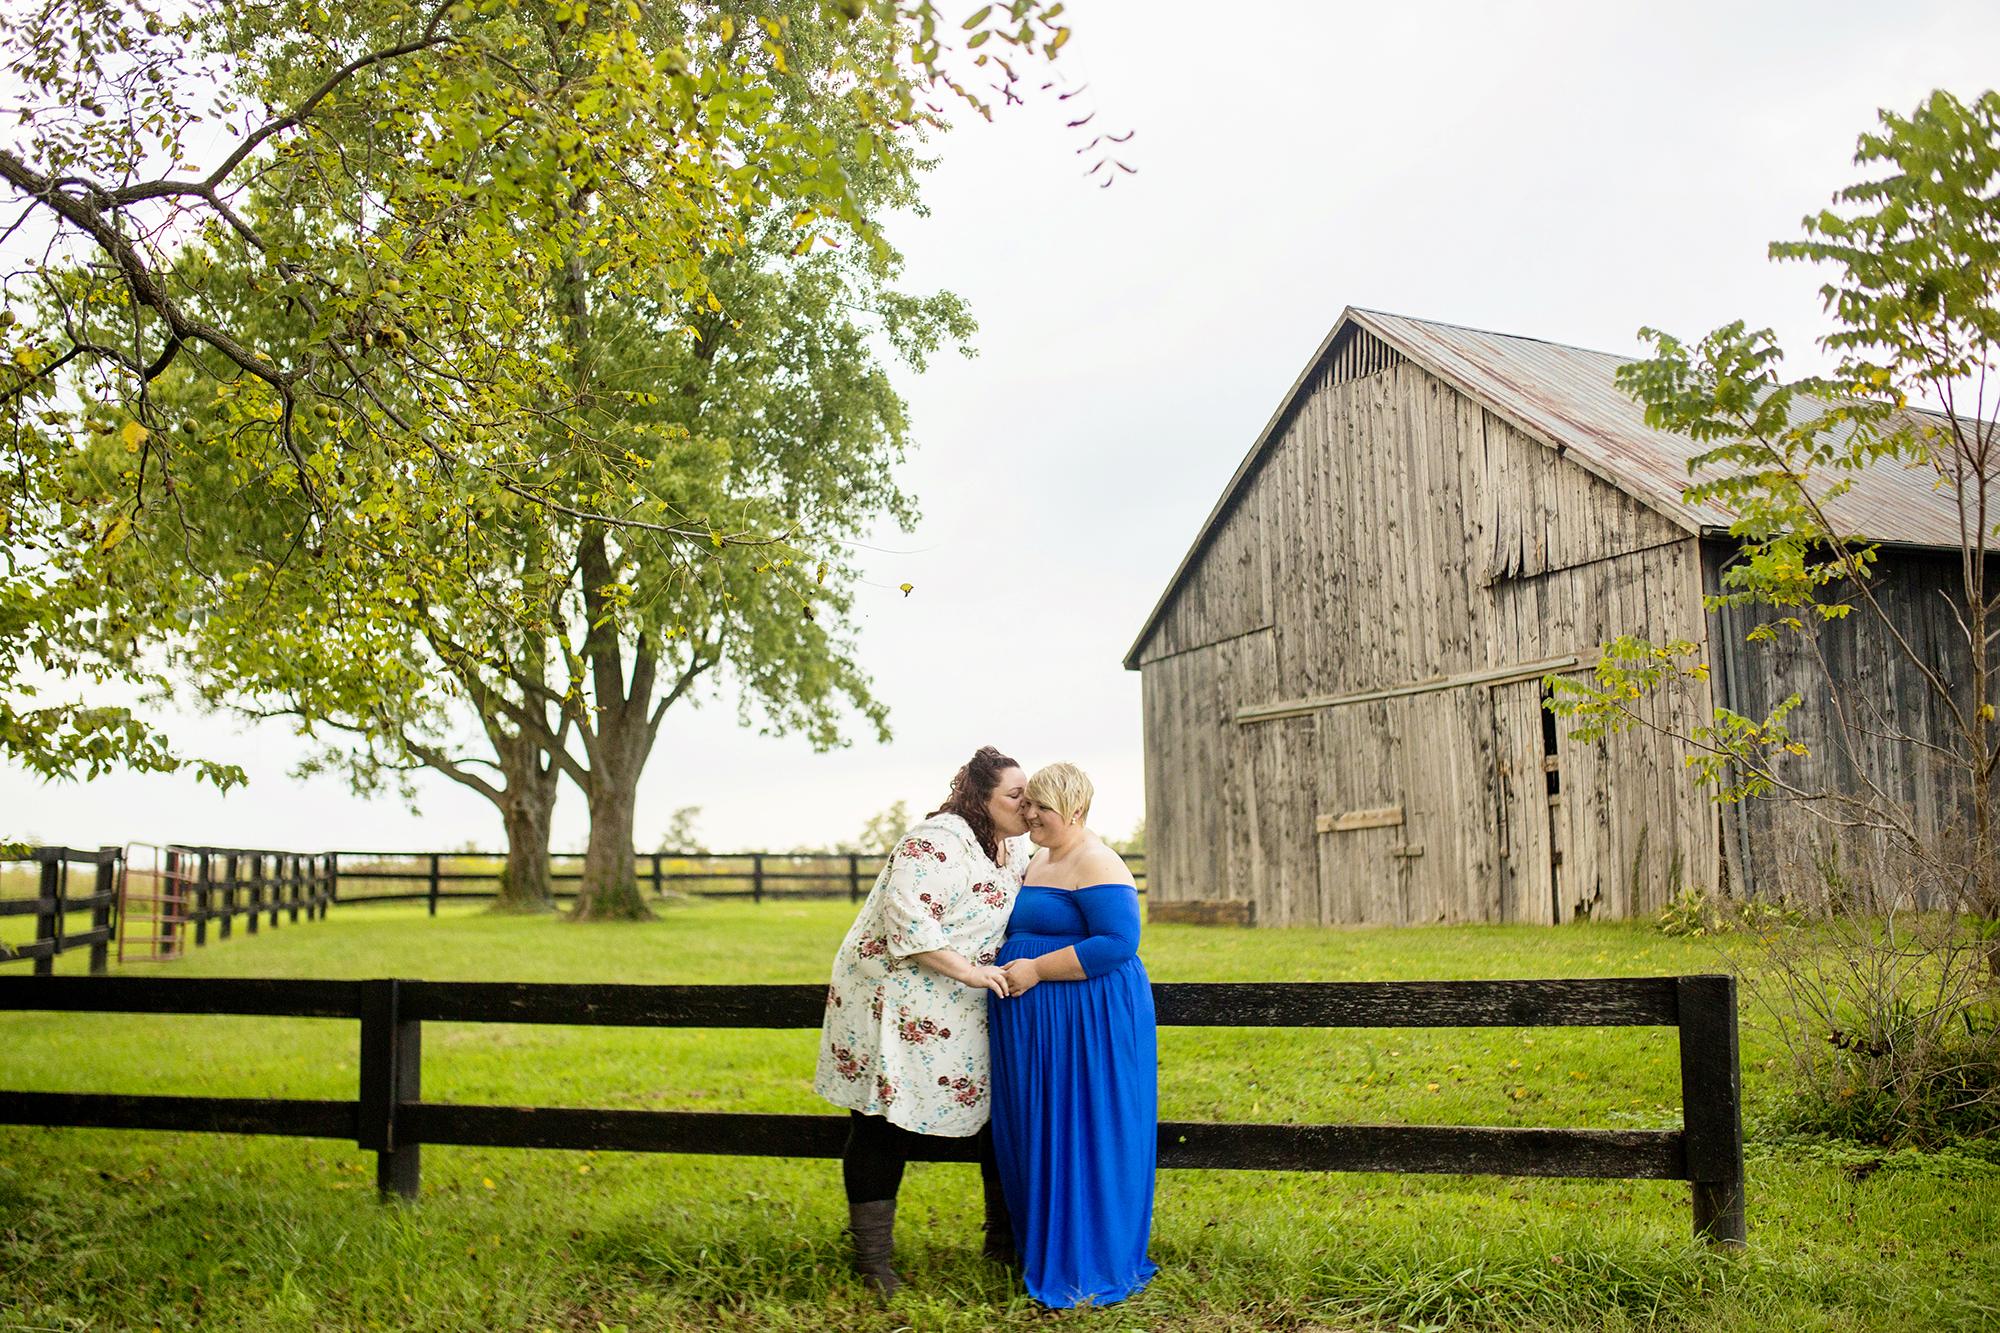 Seriously_Sabrina_Photography_Lexington_Kentucky_Maternity_Portraits_Hisle_Farm_JC5.jpg